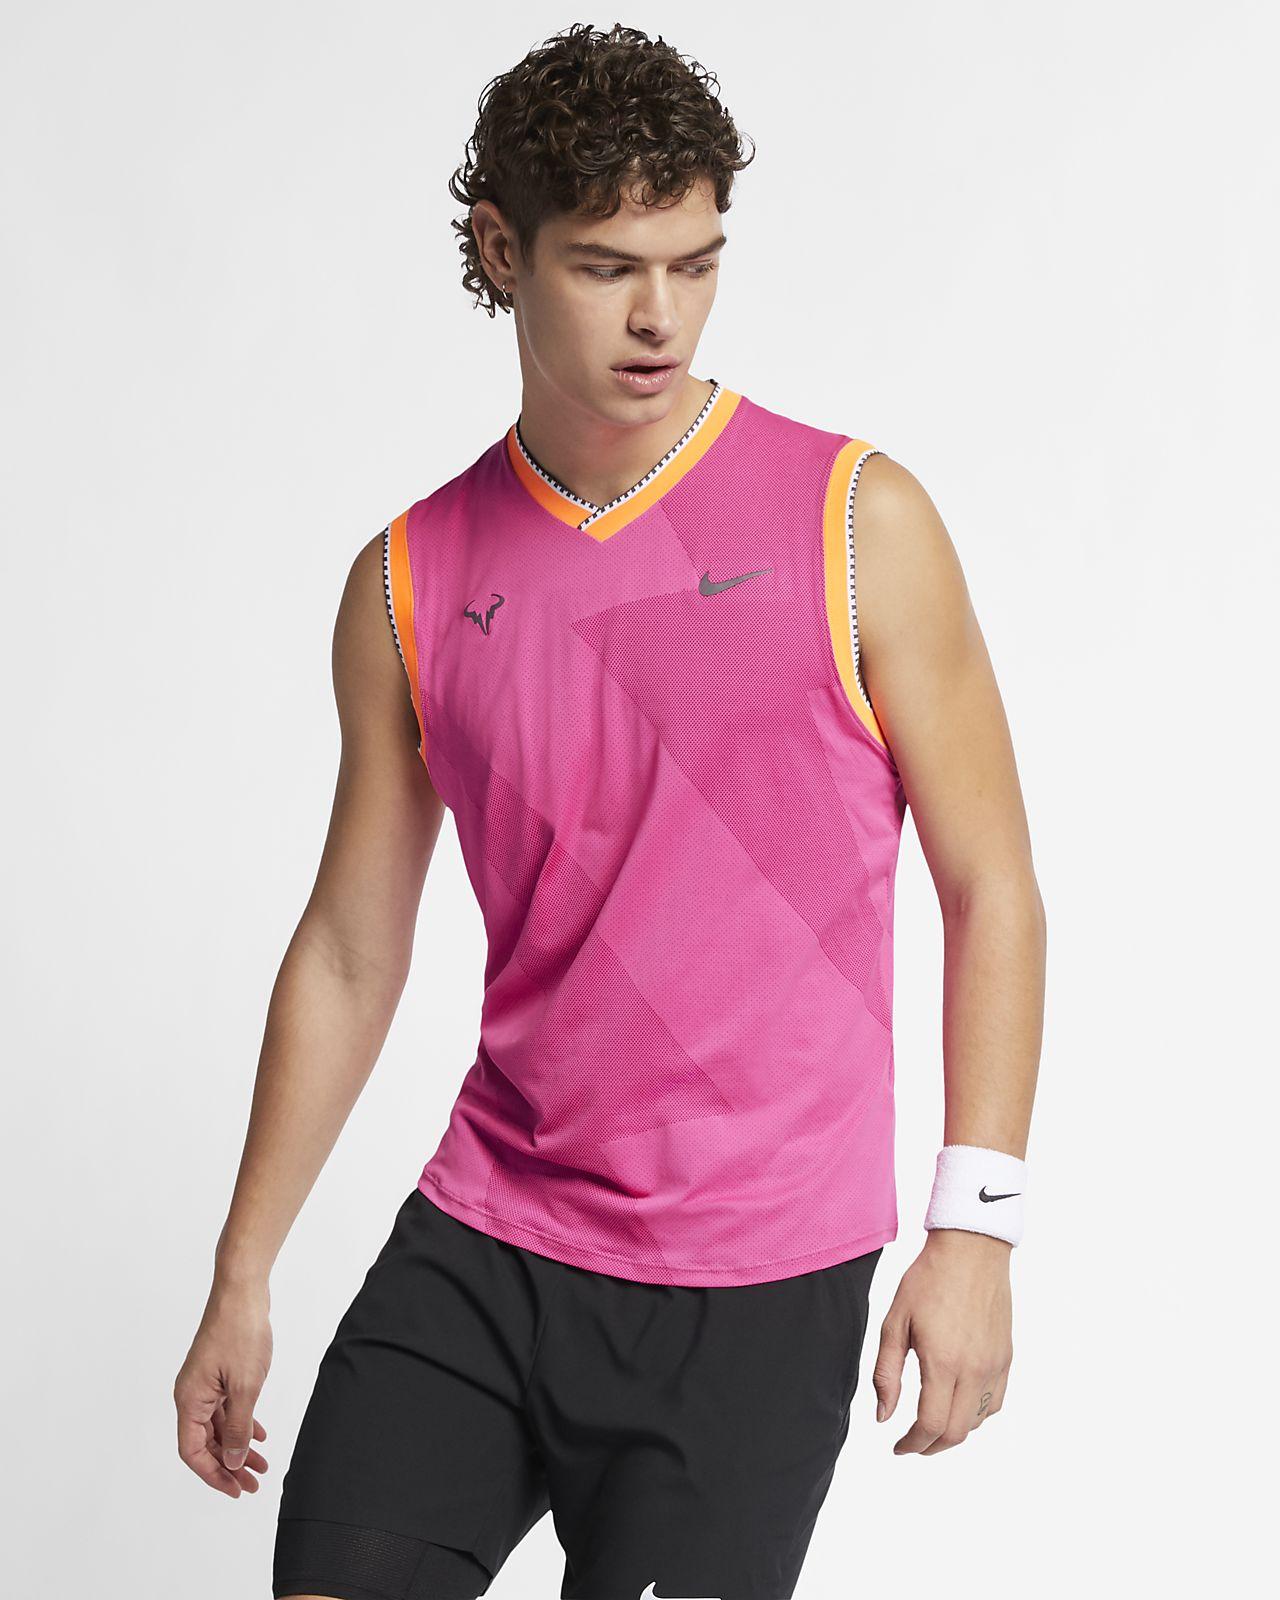 Maglia da tennis senza maniche NikeCourt AeroReact Rafa - Uomo